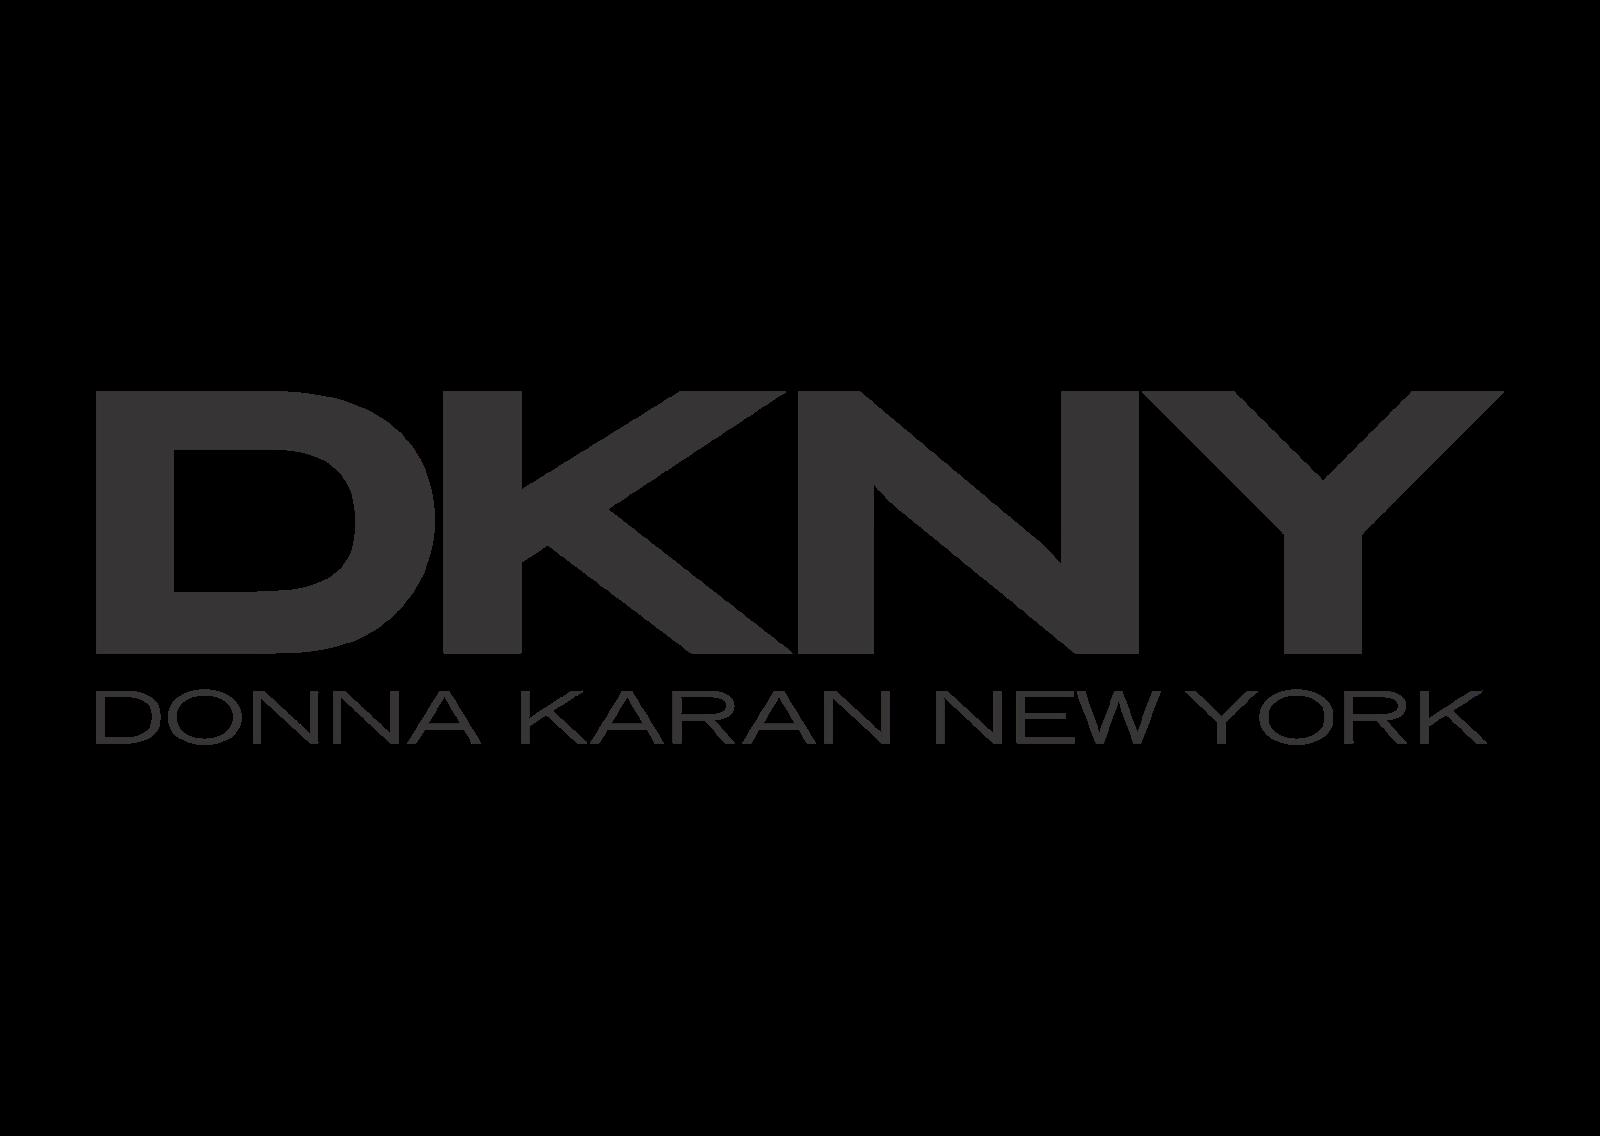 DKNY-vector-logo.png